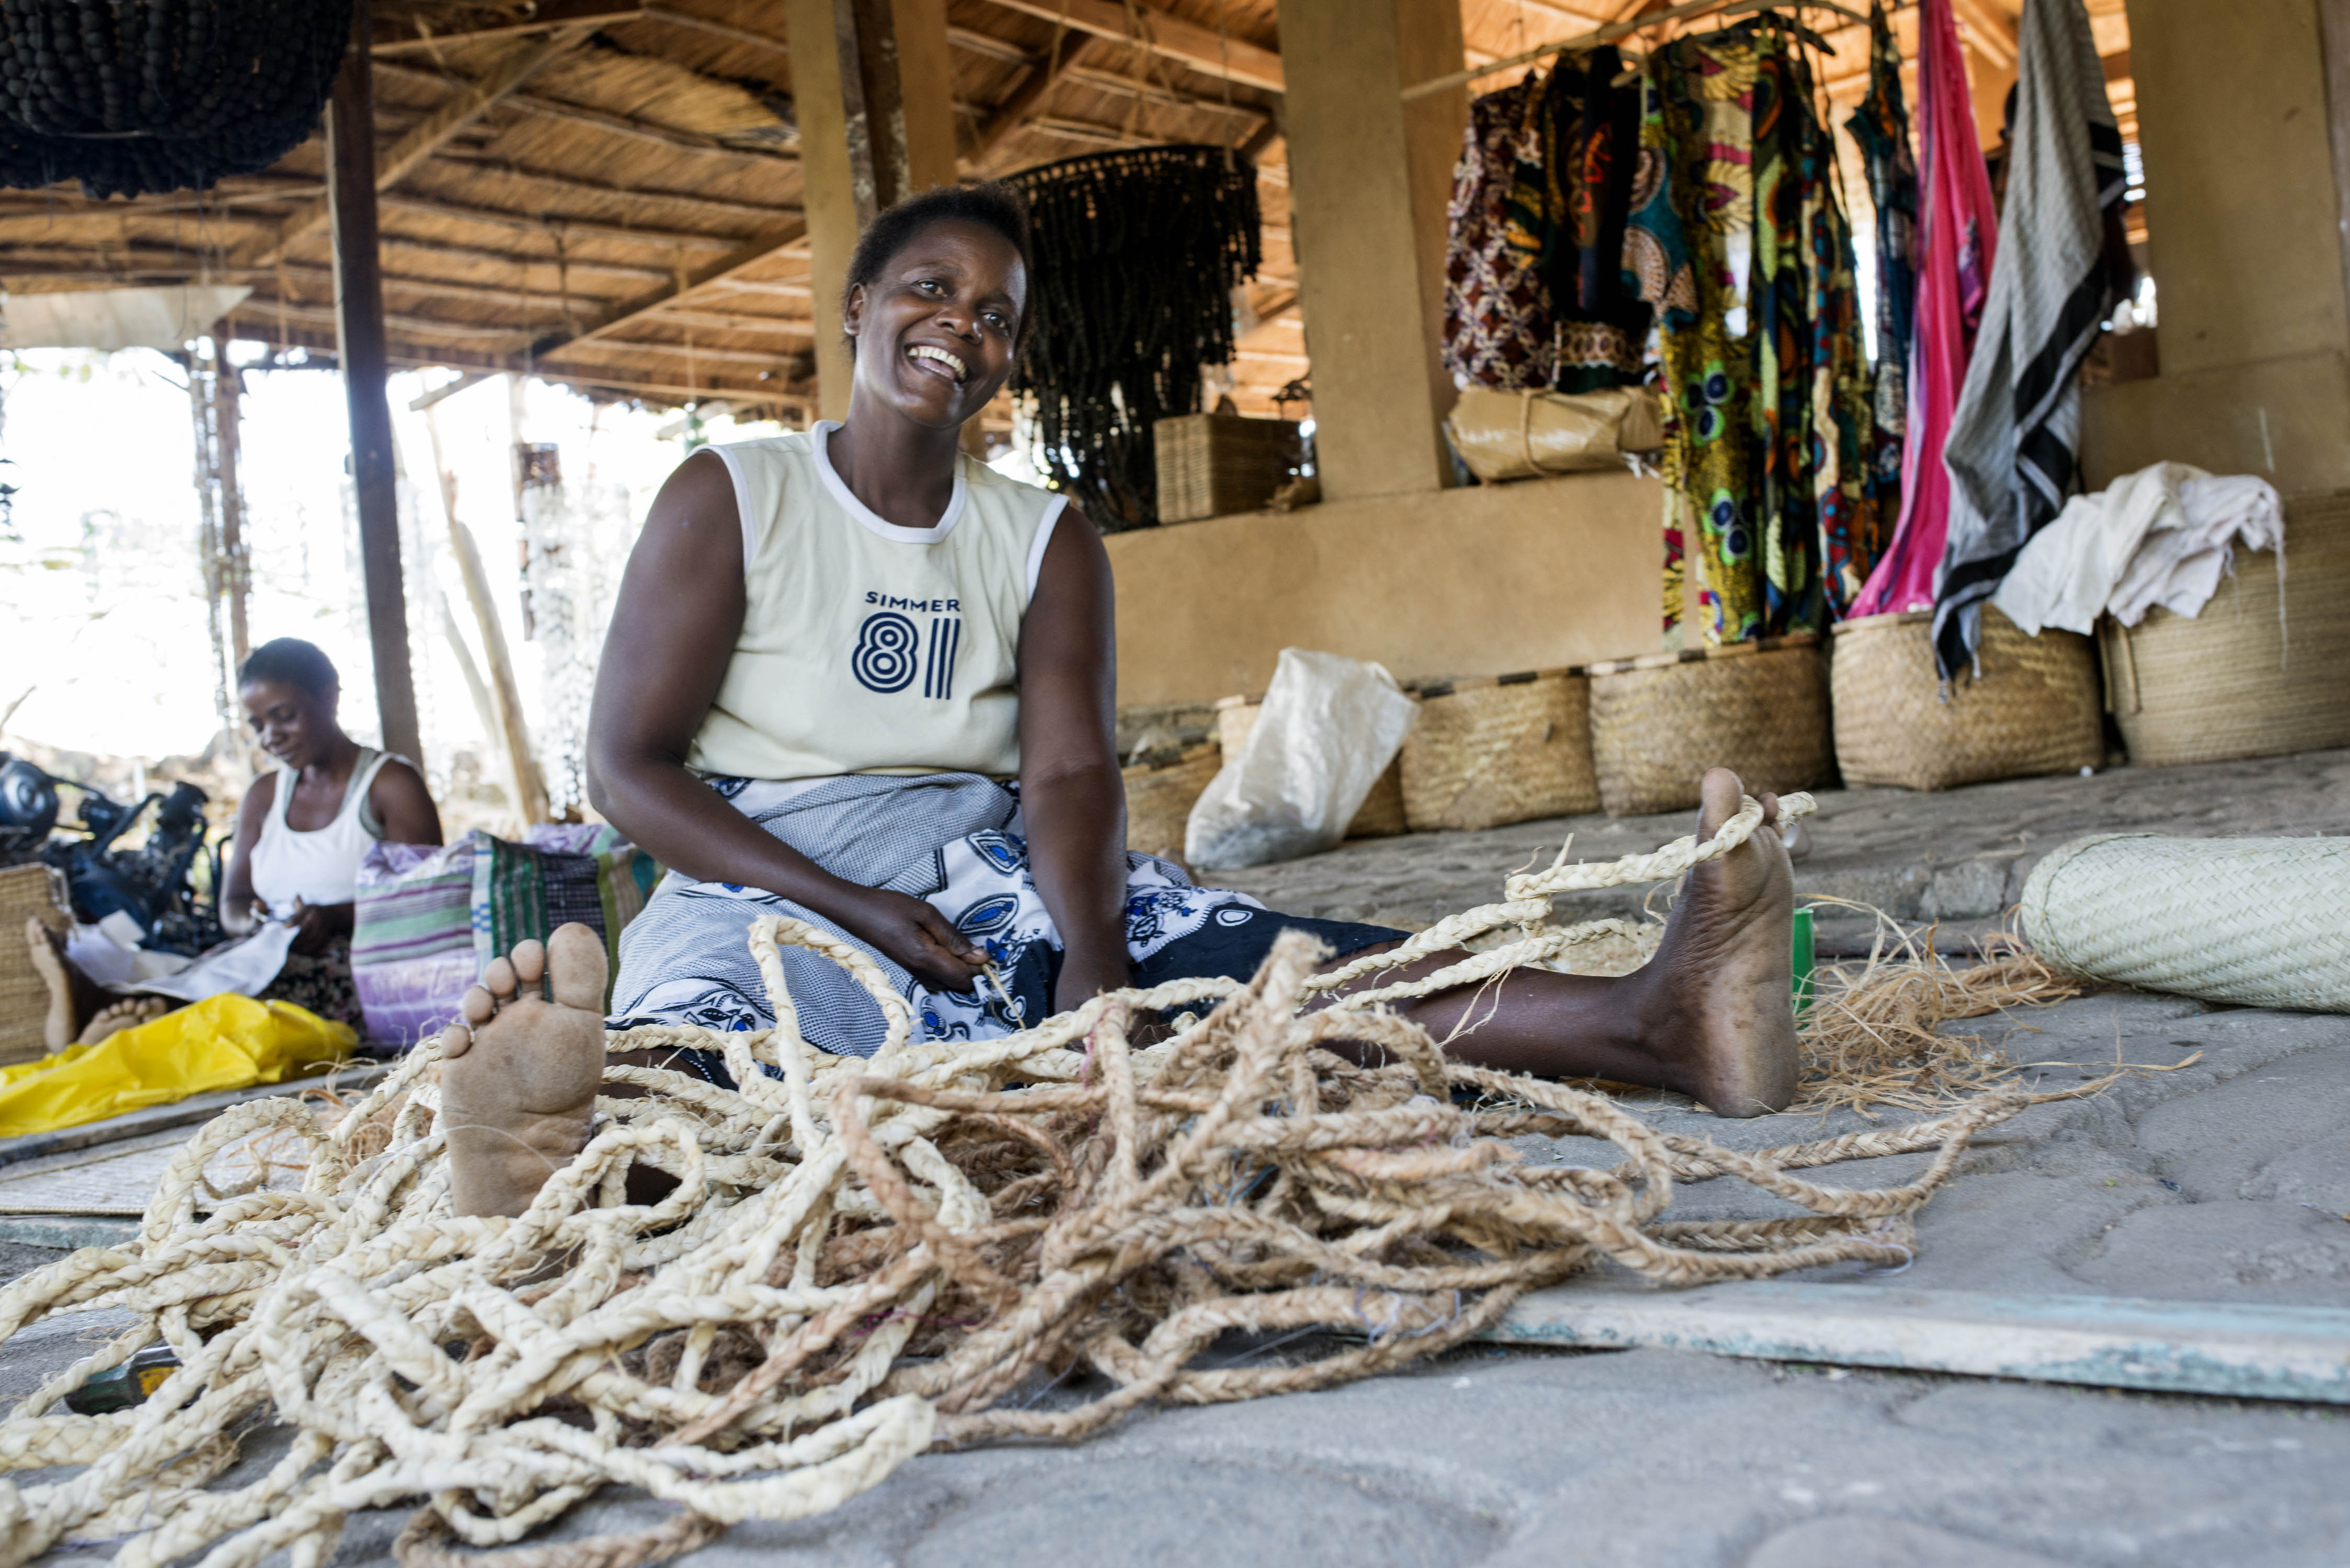 baobab maize string katundu workshop